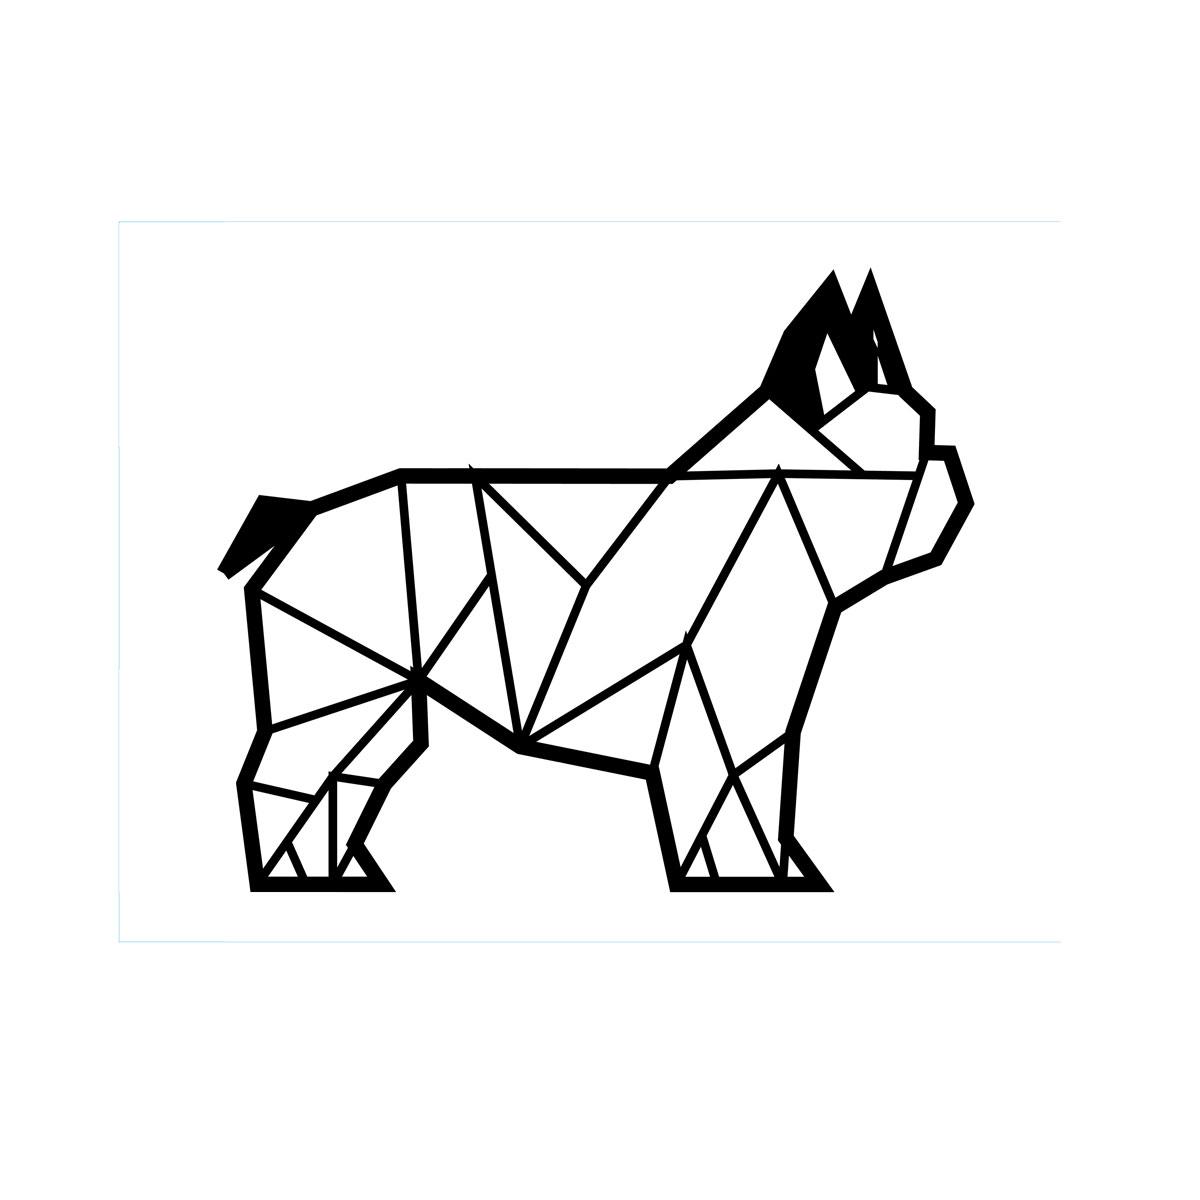 Animales Geométricos Pared Cuelgame